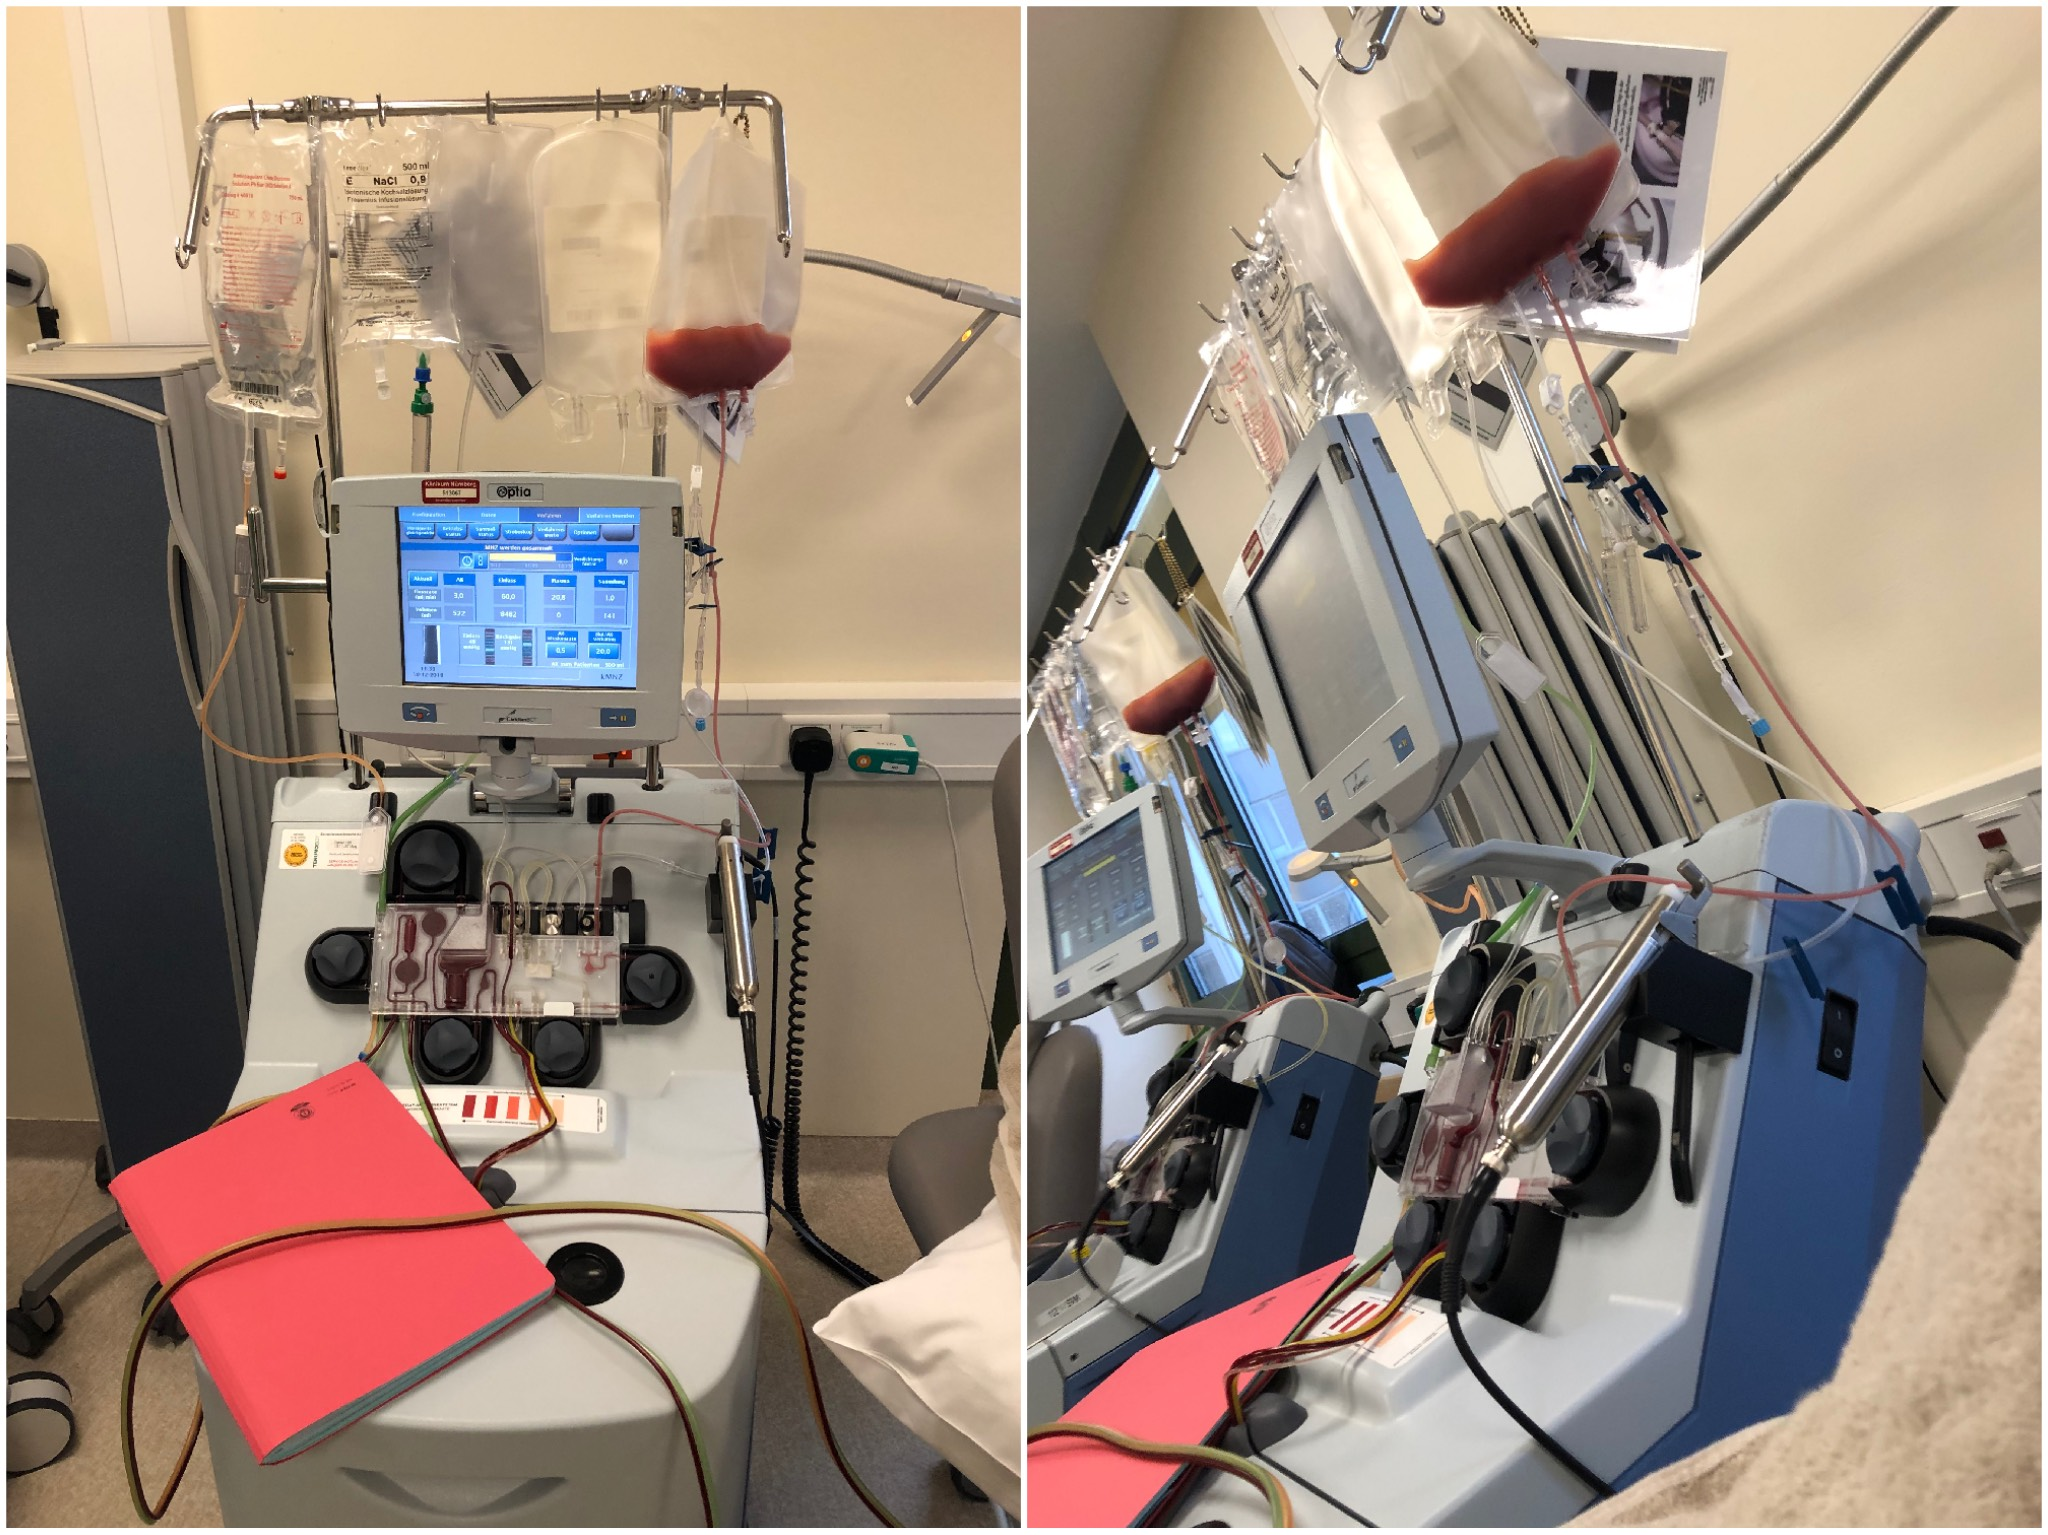 So sah es bei Marvin's Stammzellspende im Klinikum Nürnberg aus. Foto: Marvin Herrmann